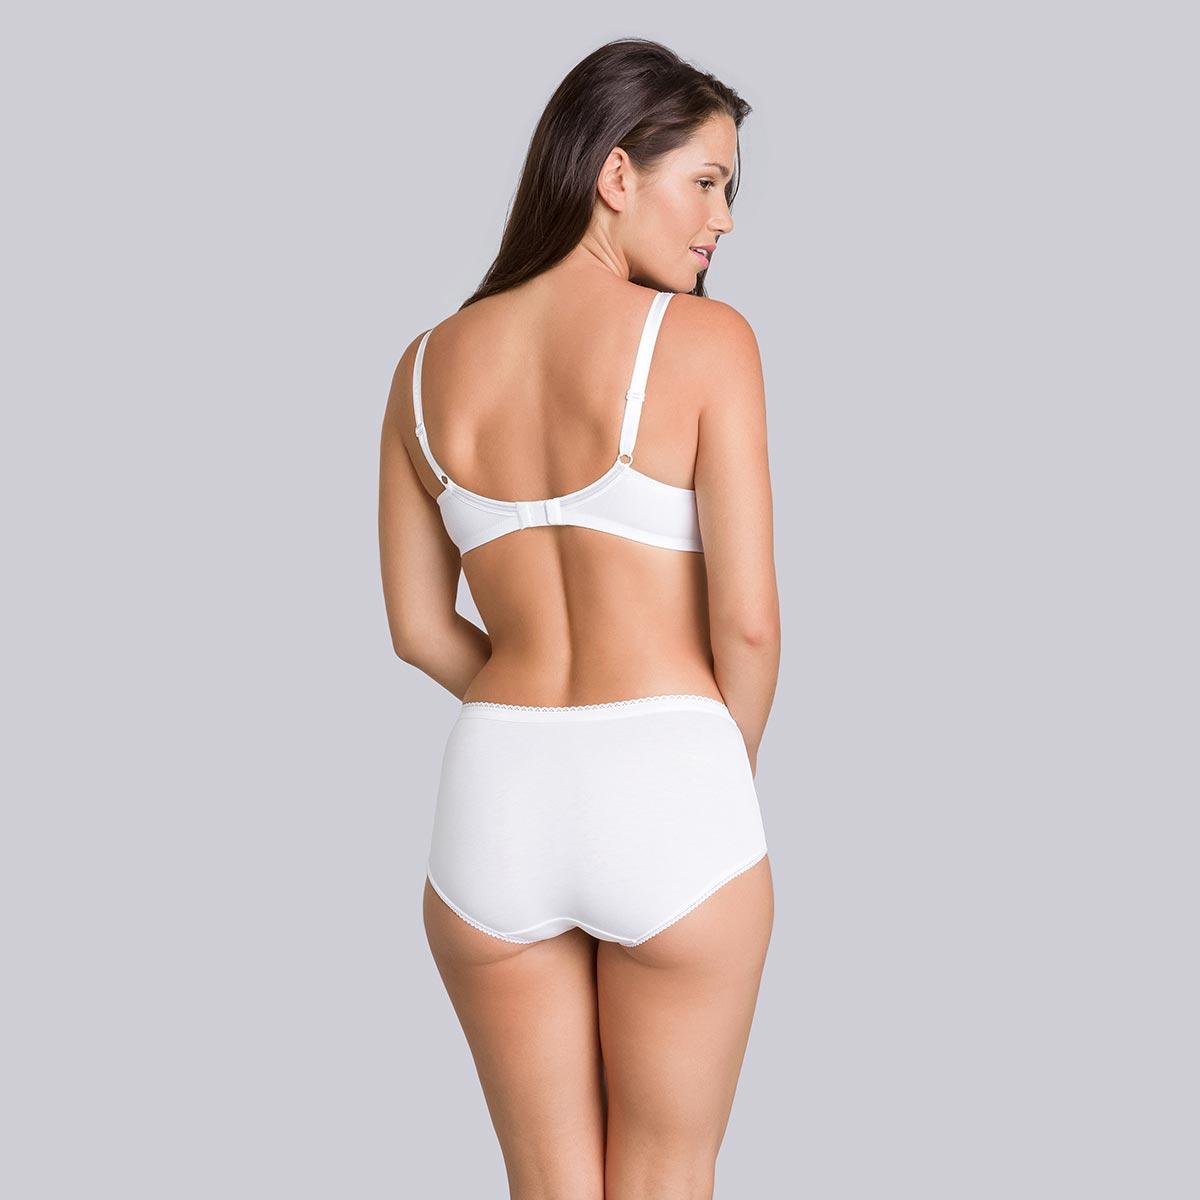 Non-Wired Cotton Bra in White - Cotton Support-PLAYTEX